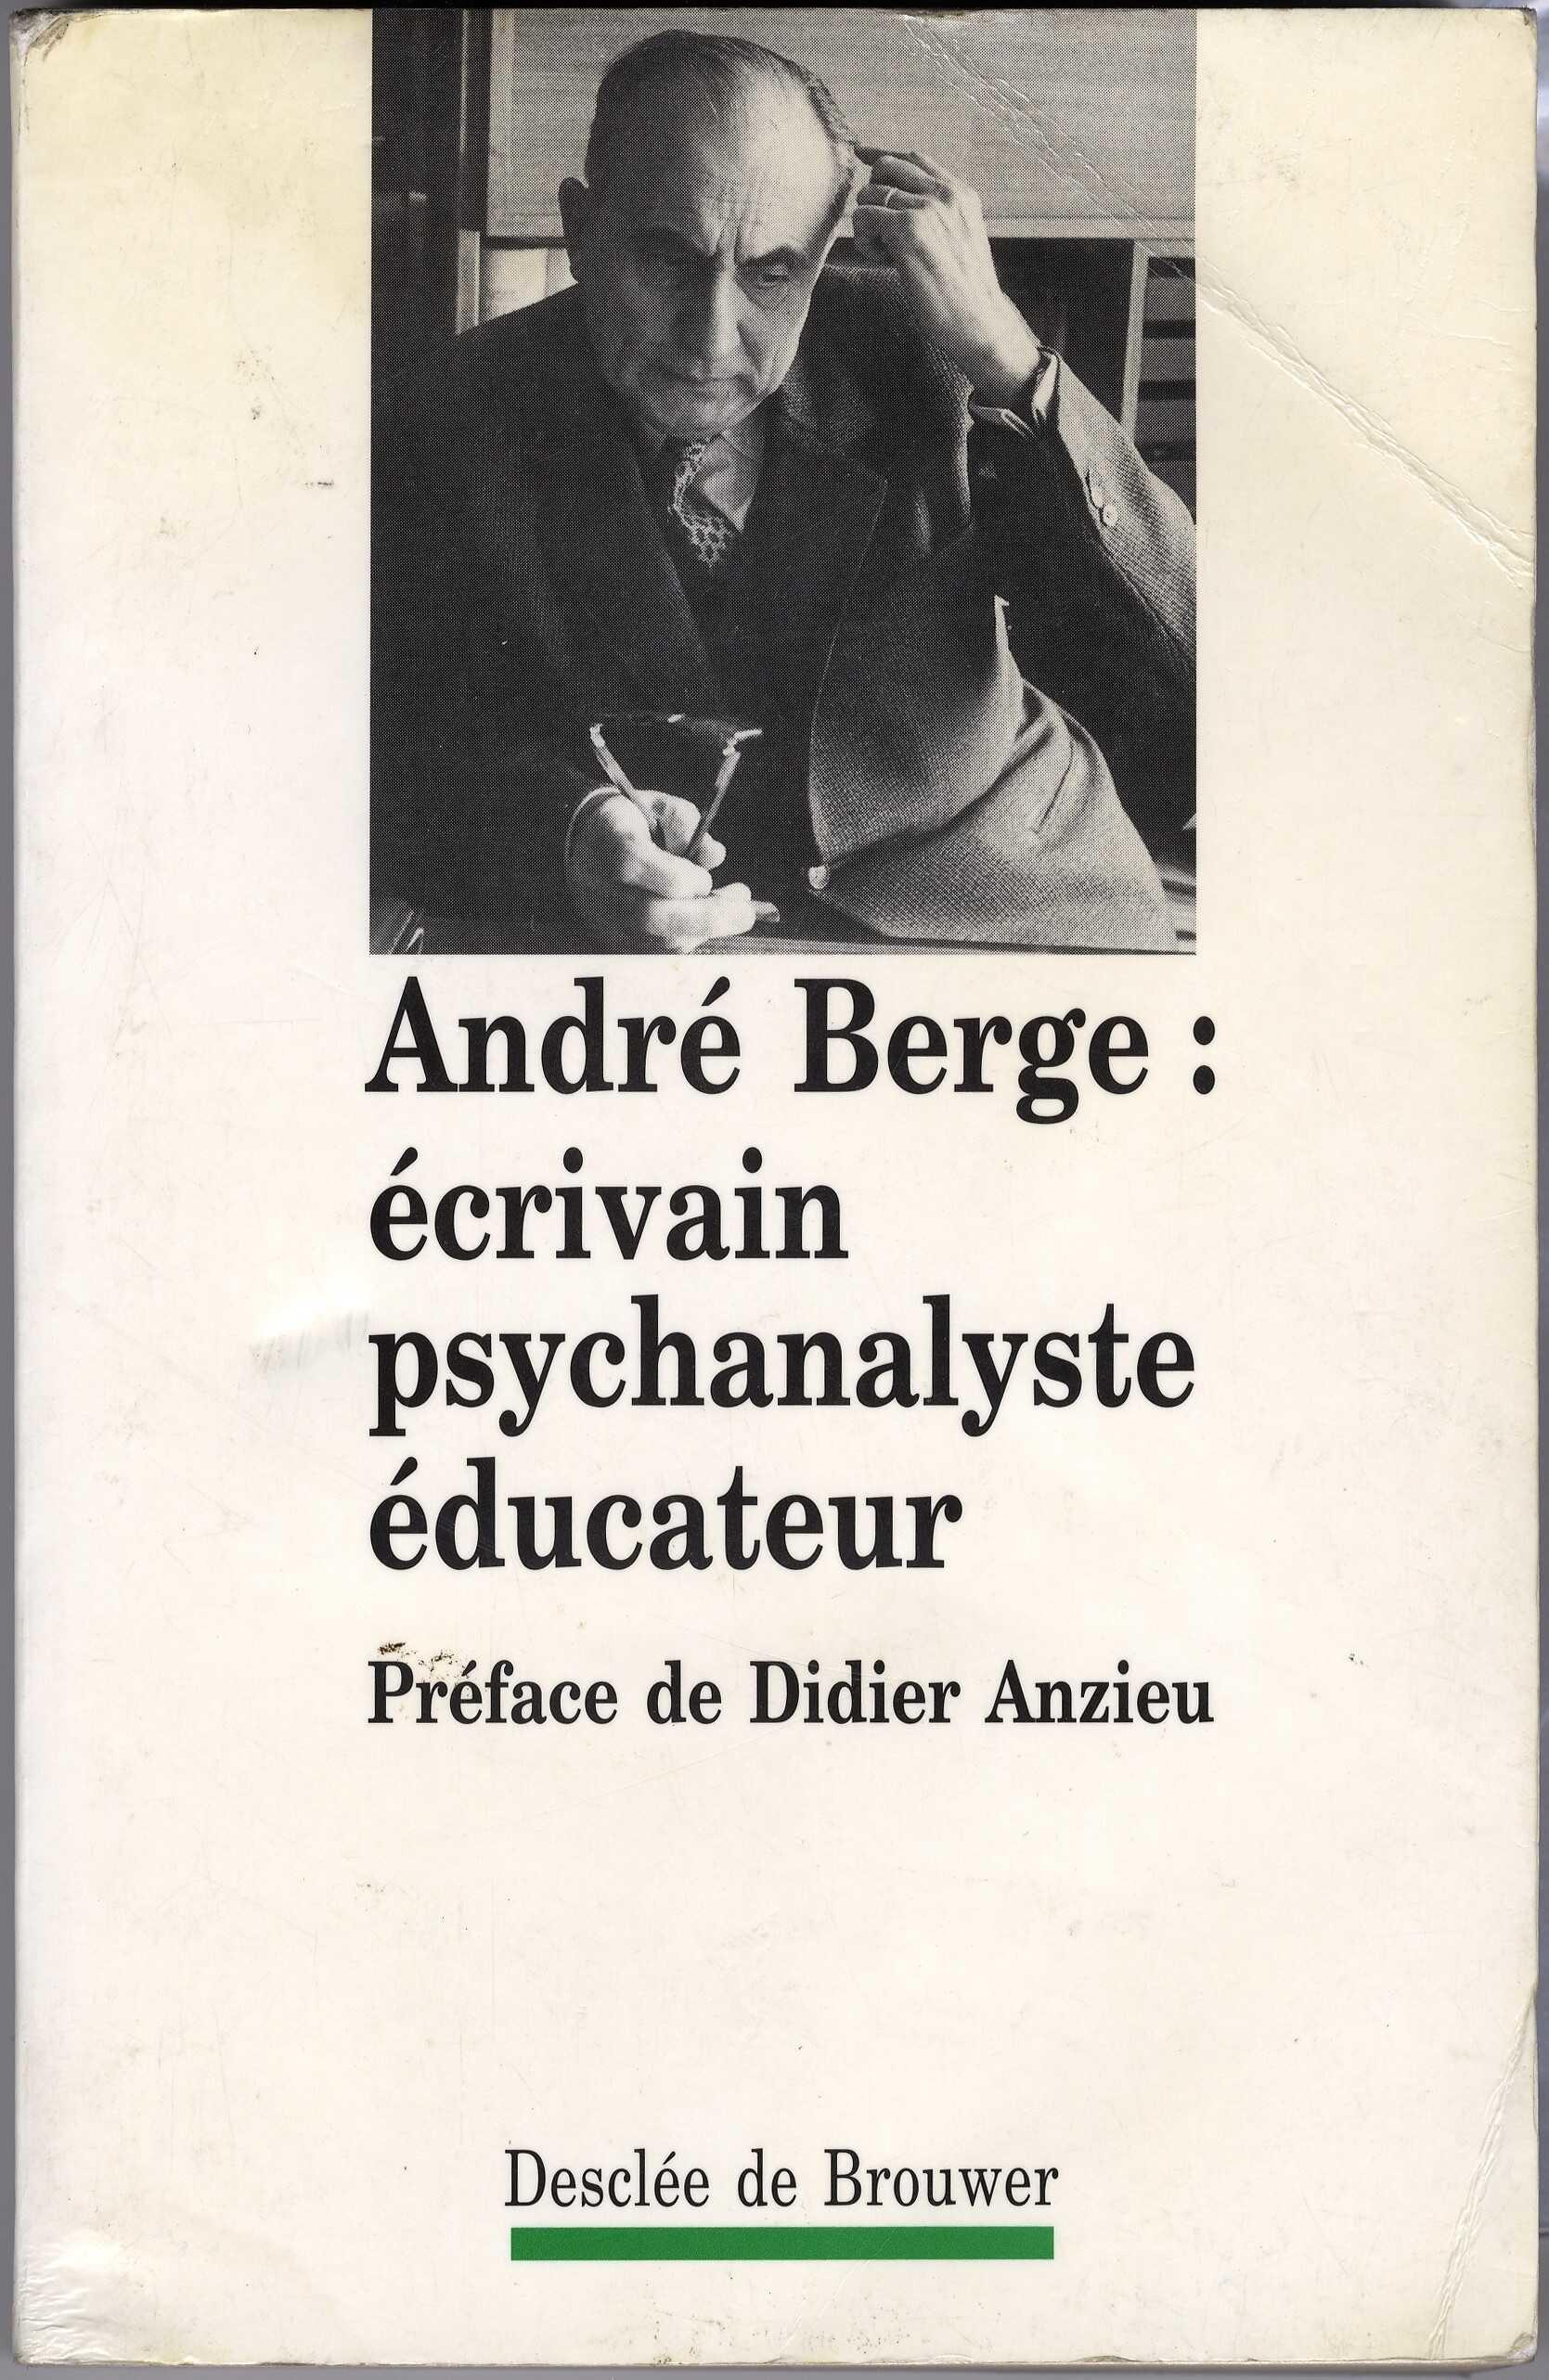 image for Desclée de Brouwer